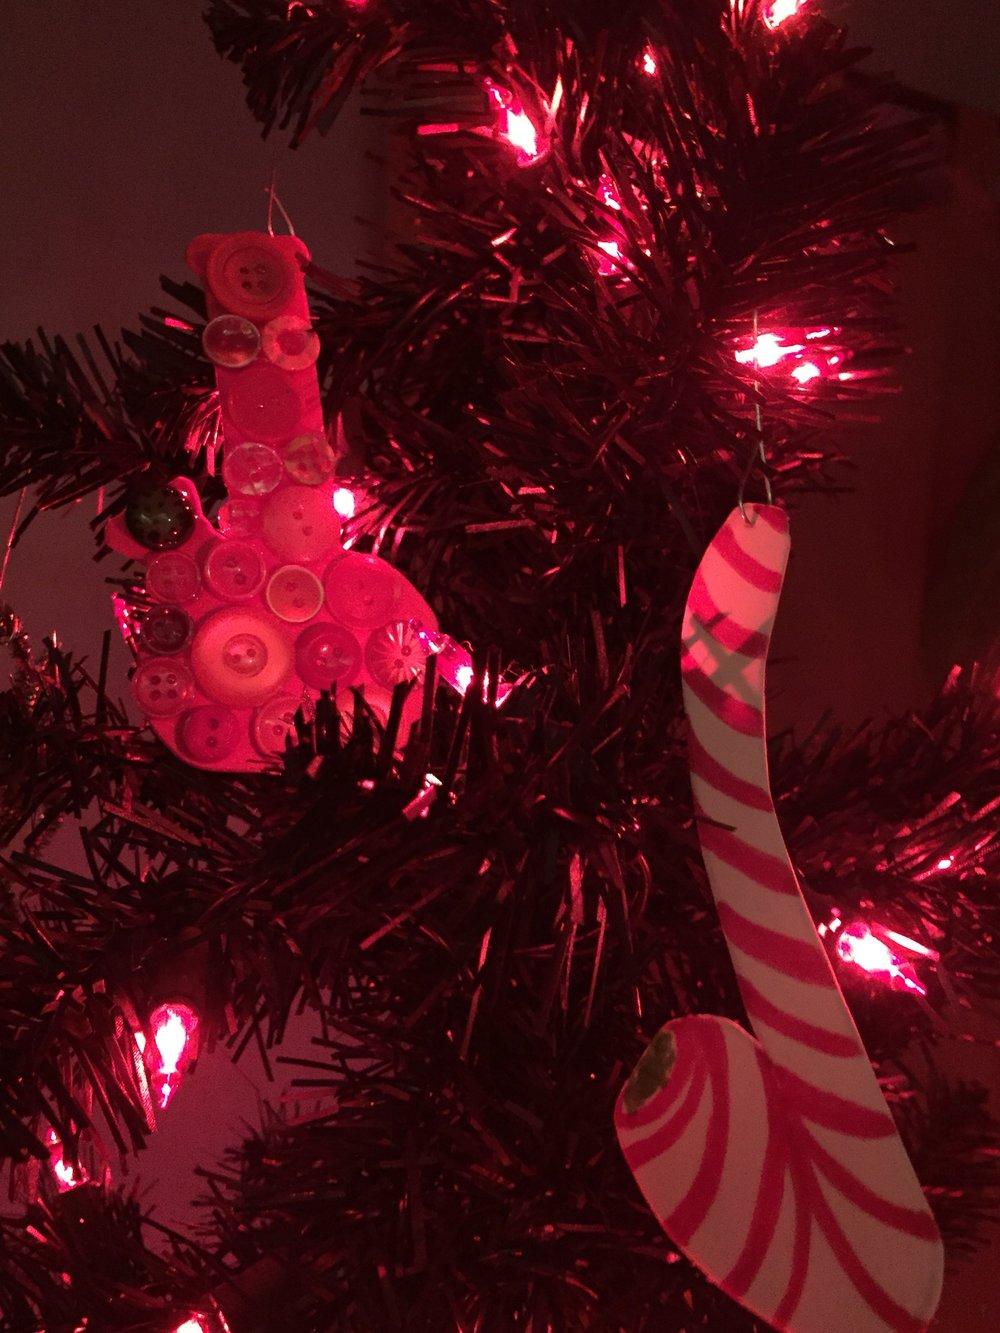 The Stoner's Cannabis Christmas (Kushmas) Tree